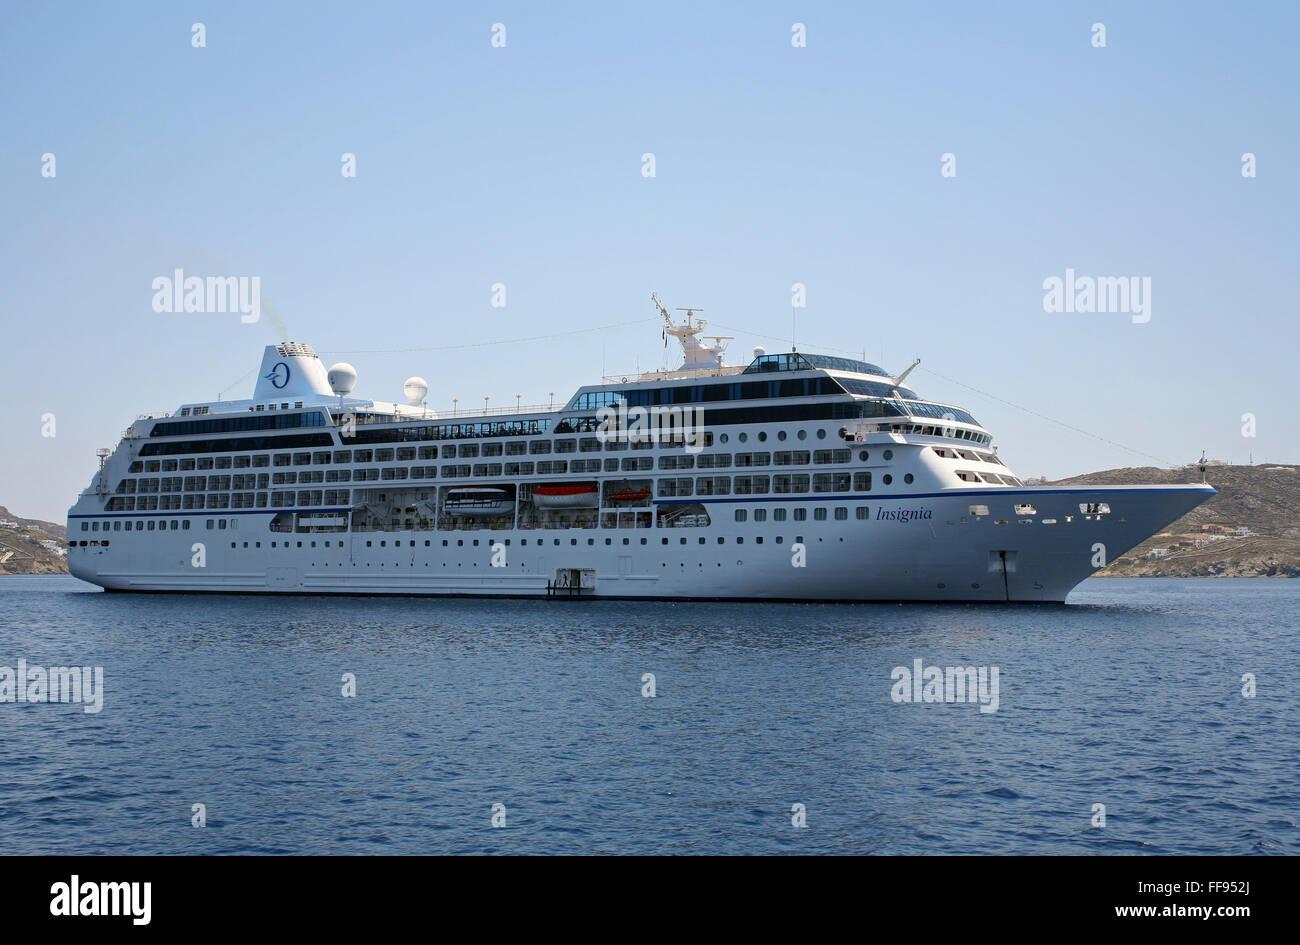 MS Insignia Oceania Cruises Regatta Class Cruise Ship Mykonos Harbor Cyclades Aegean Sea Greece EU European Union - Stock Image